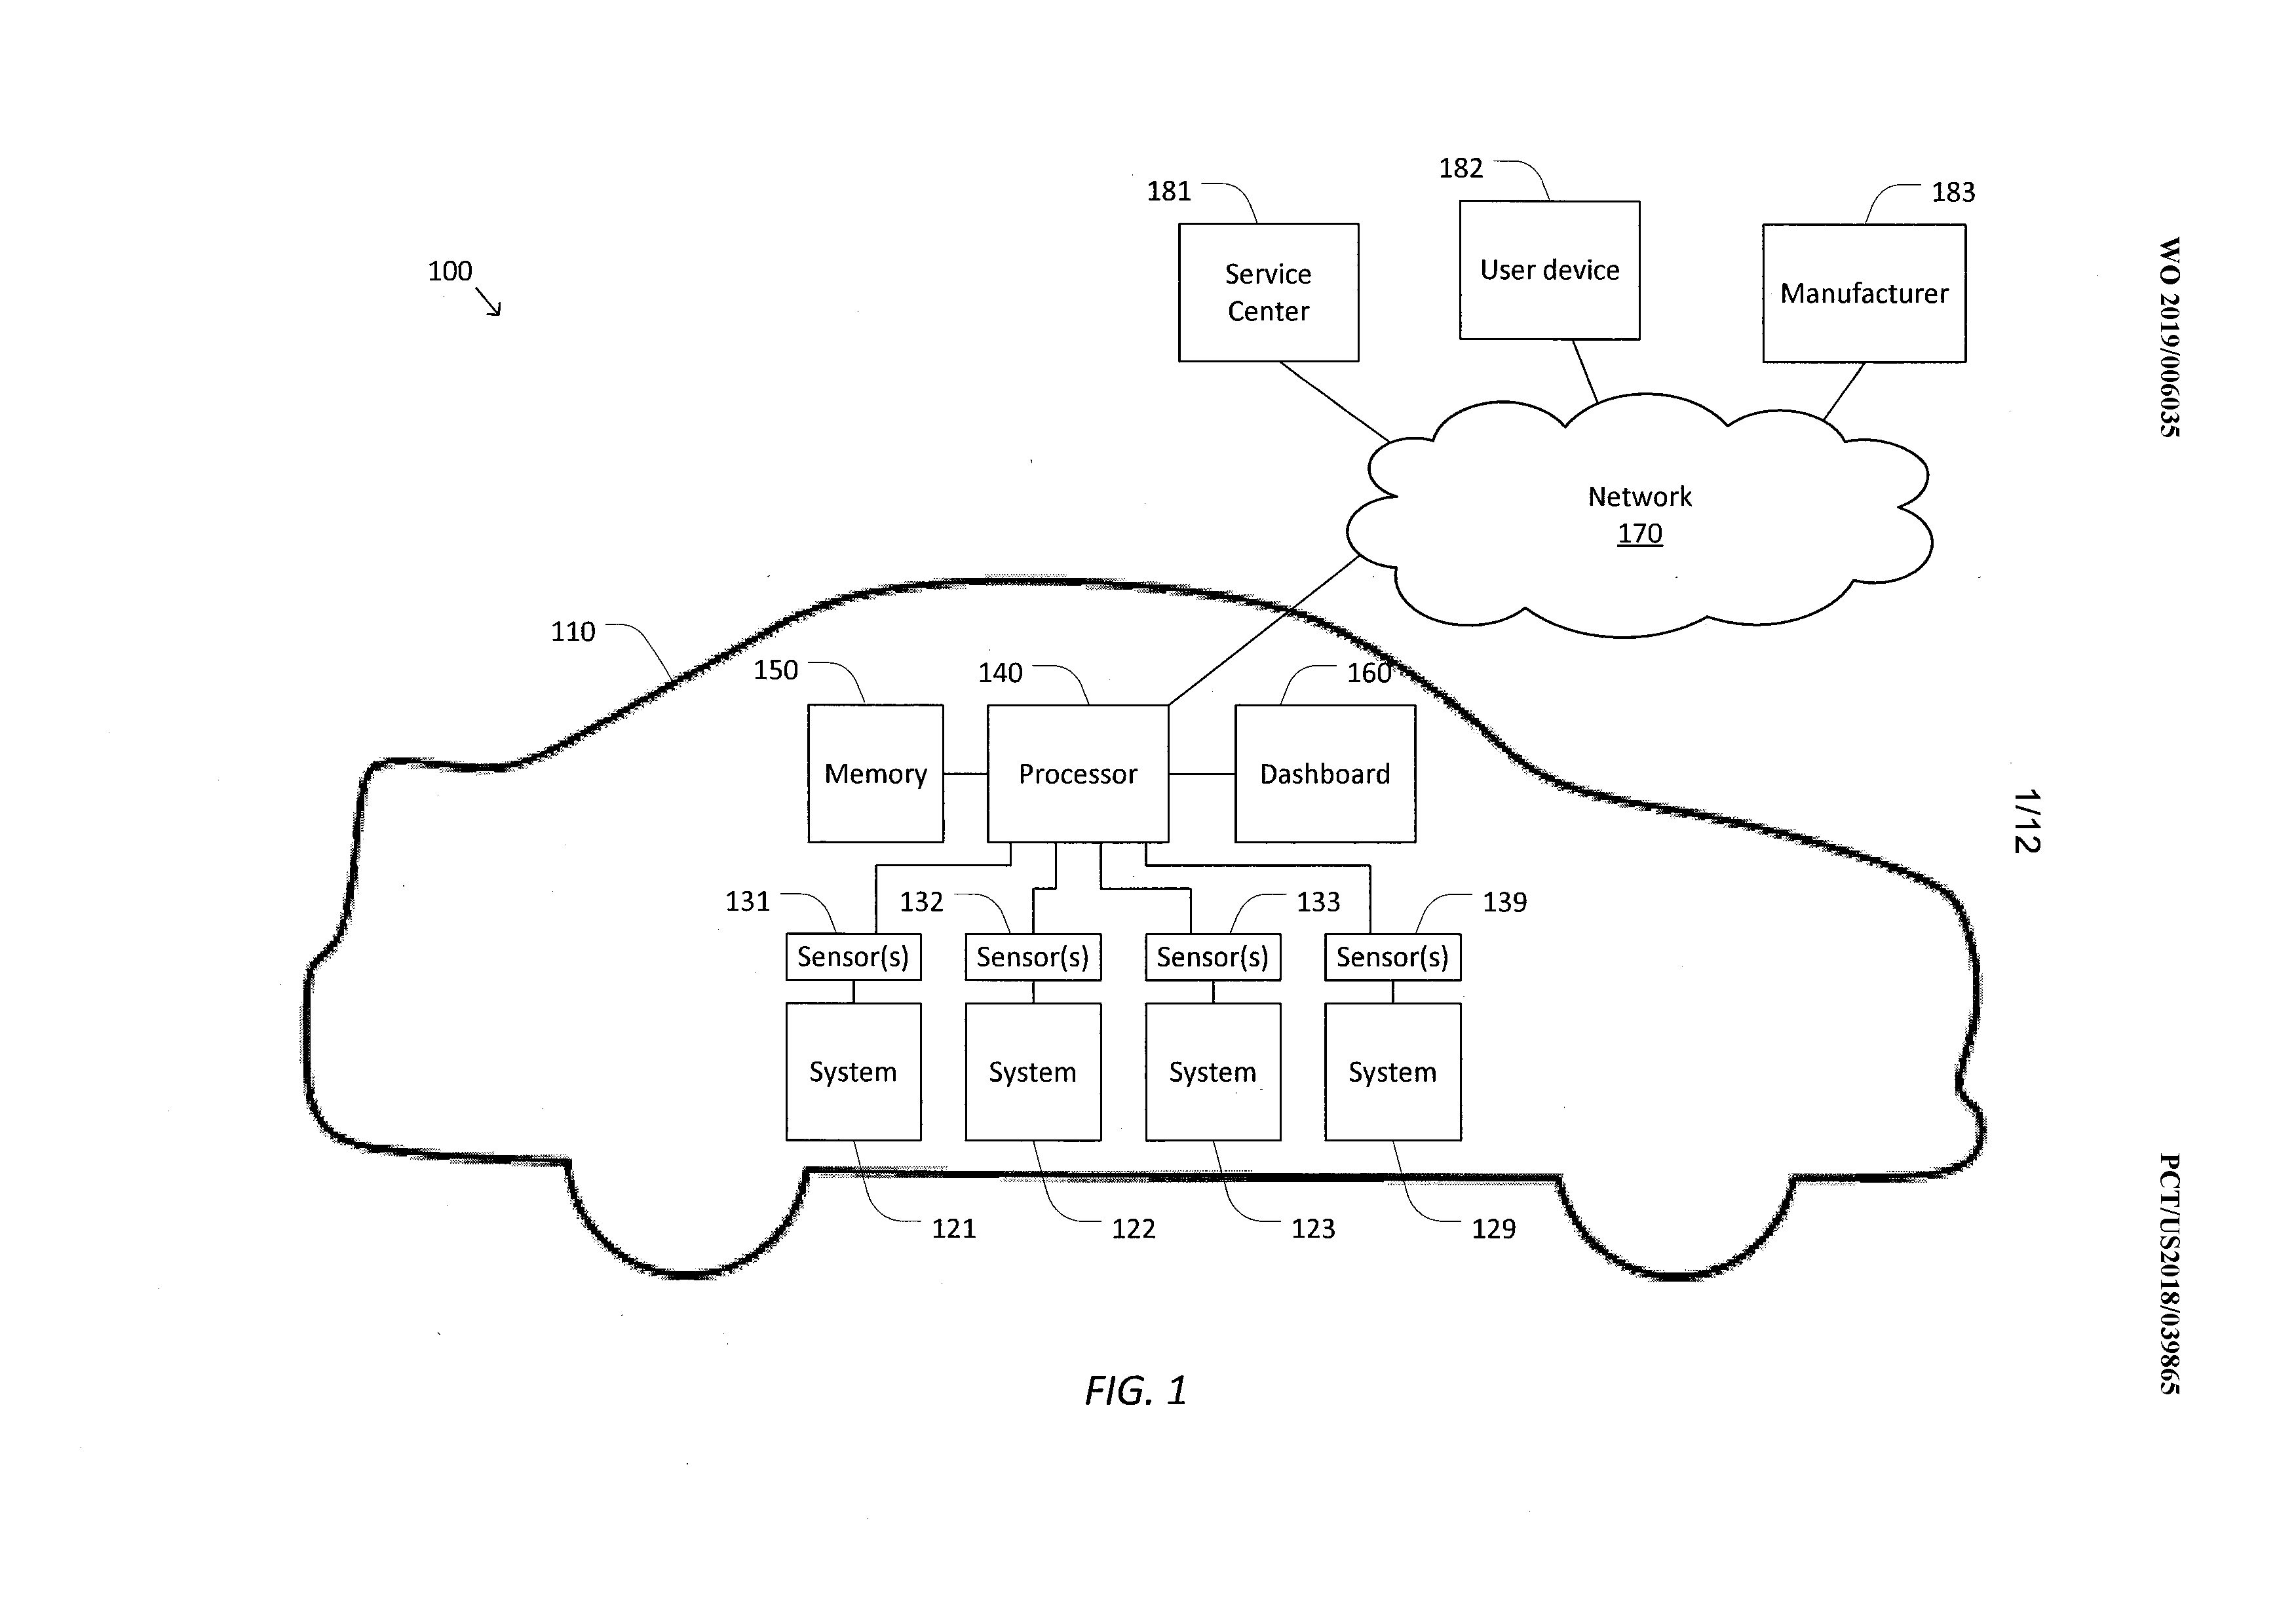 tesla patent outlines proactive damage monitoring system